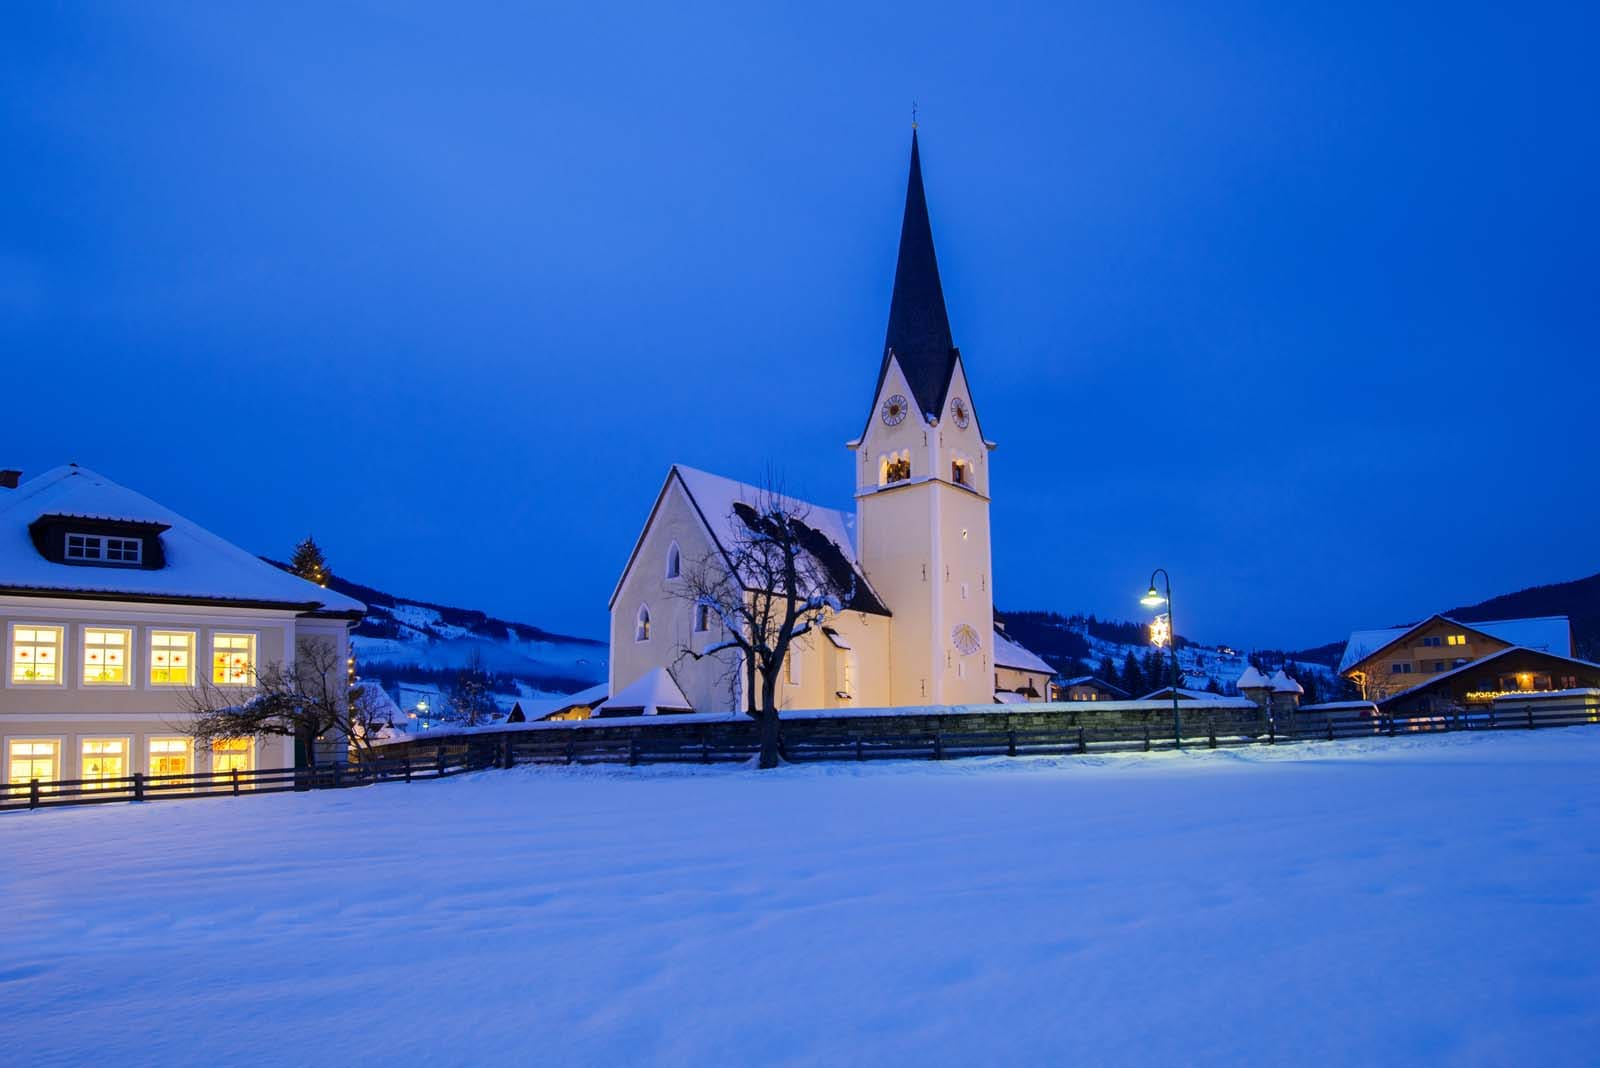 church and school in Wagrain in Salzburg